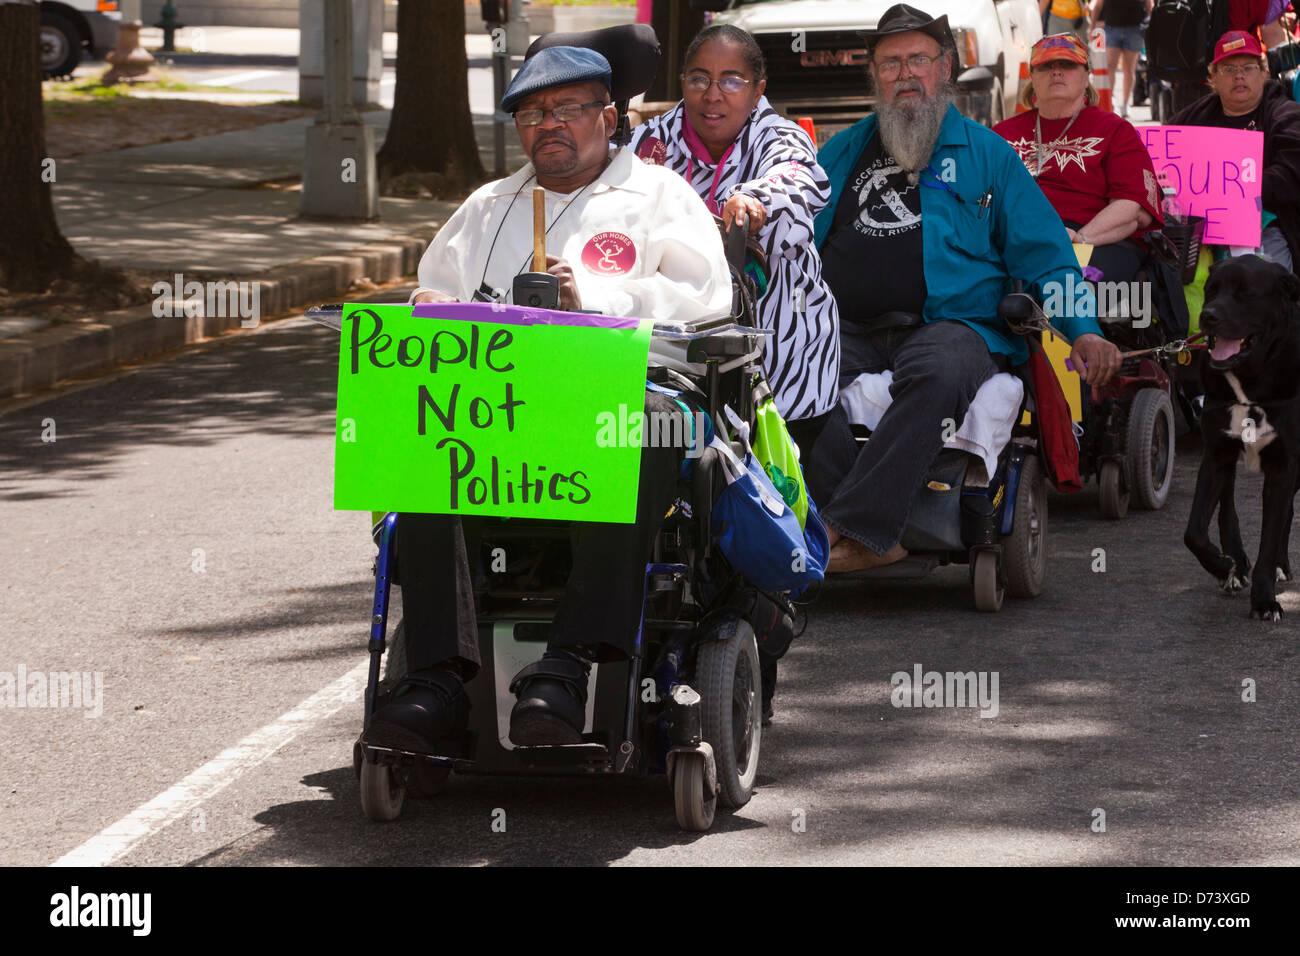 Behinderung Rechte Gruppe, ADAPT, Kundgebung gegen Medicaid in Washington, D.C. Stockbild